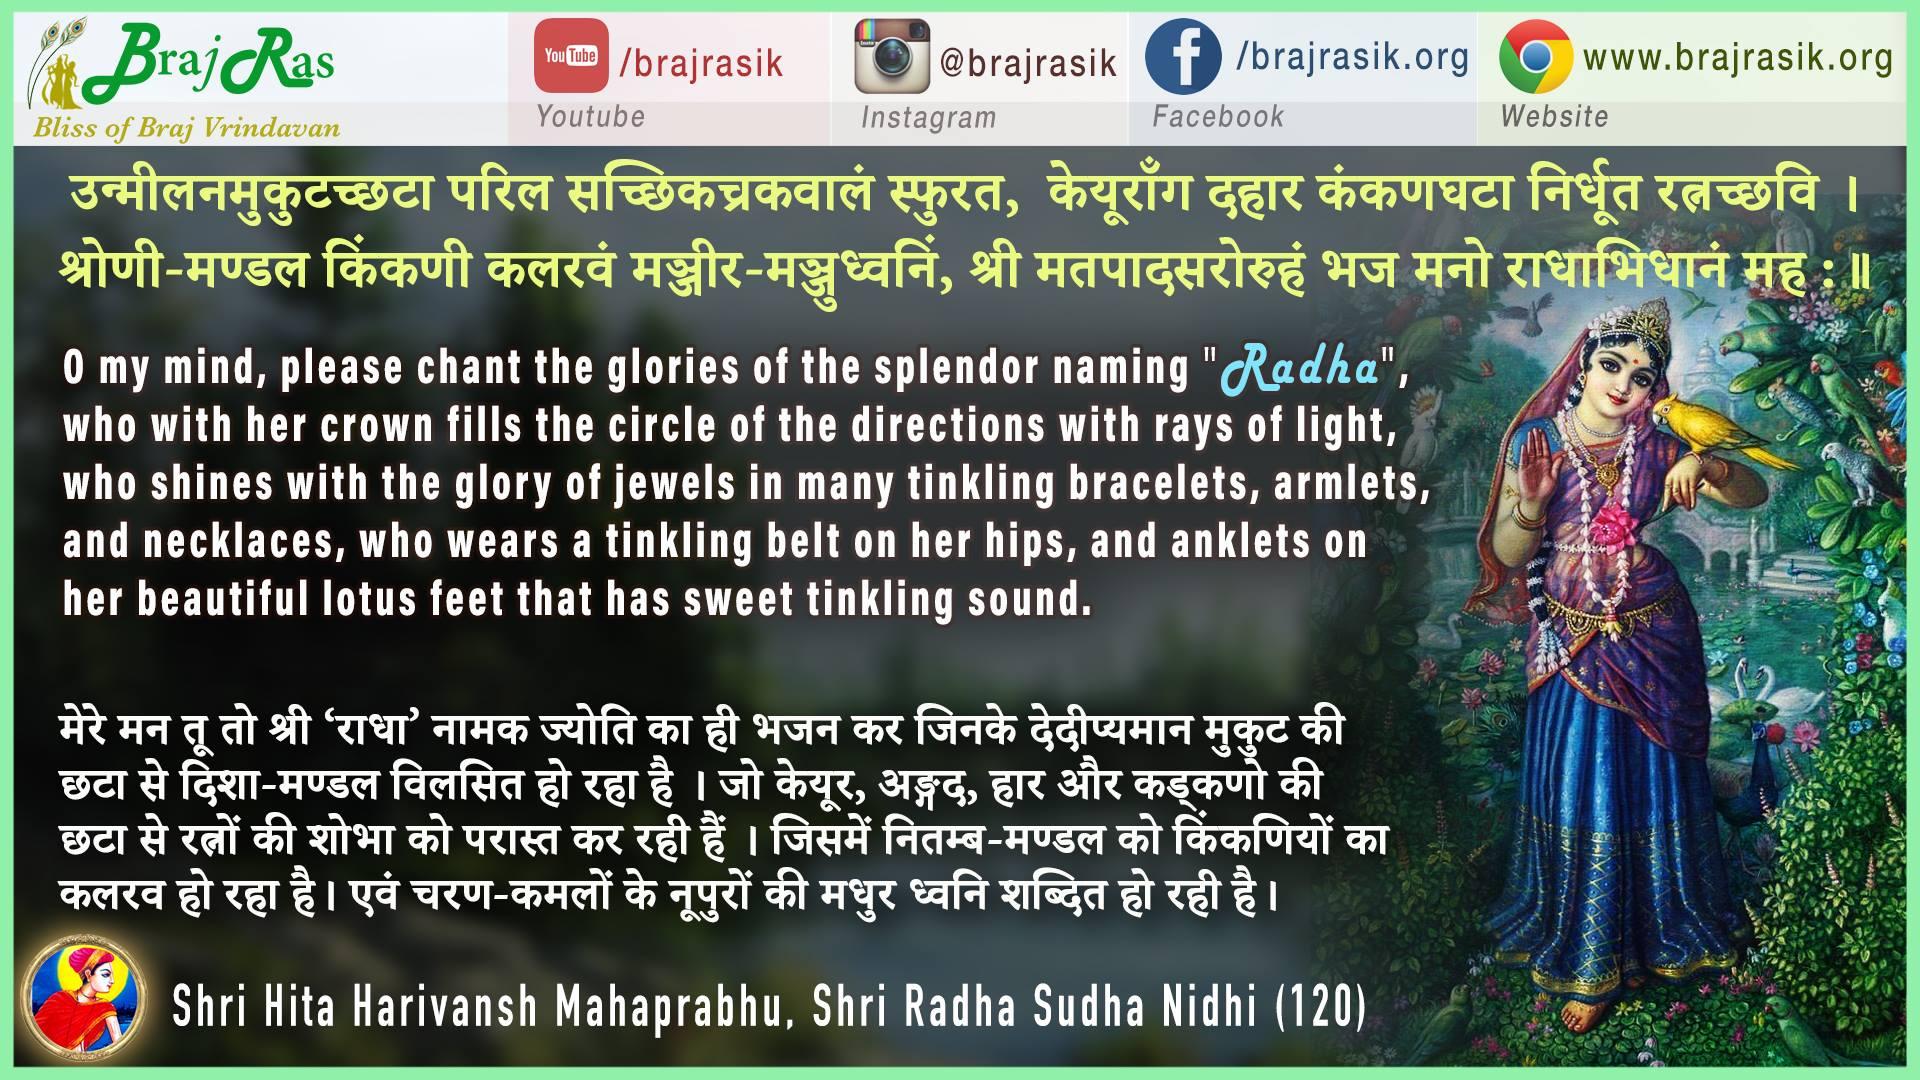 Unmilan Mukut Chata Parilasad Dik - Shri Hita Harivansh Mahaprabhu, Shri Radha Sudha Nidhi (120)